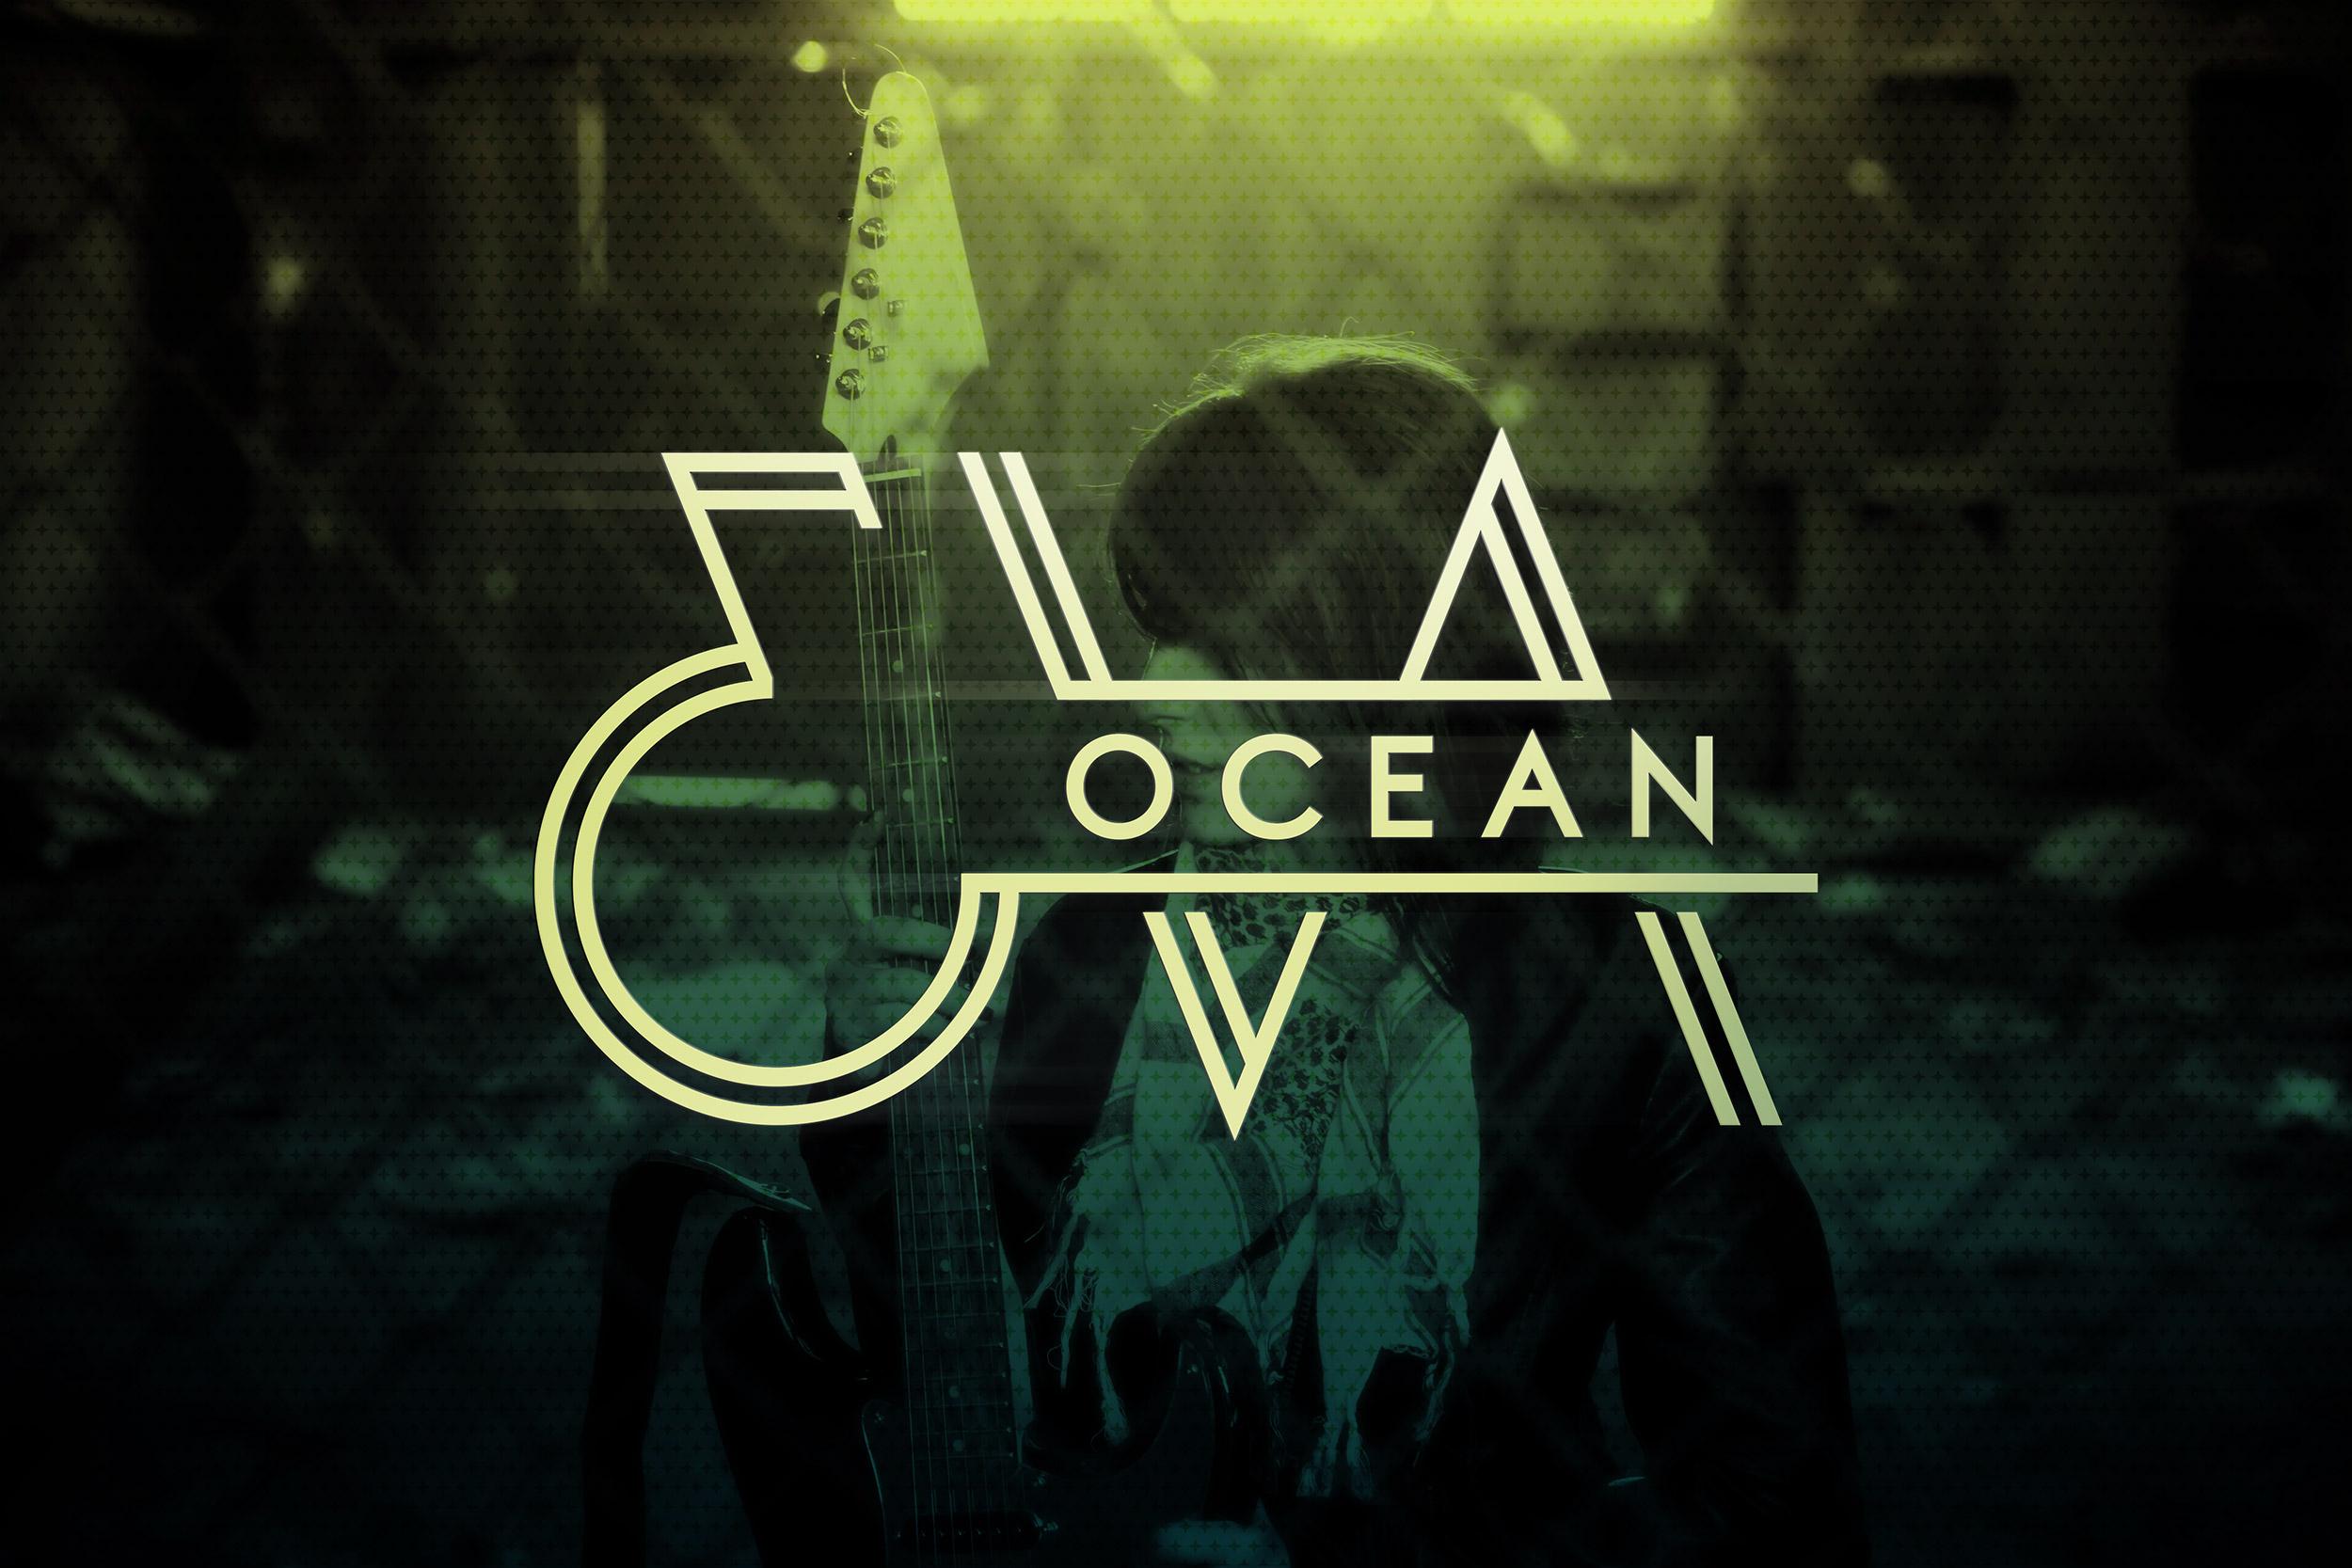 Eva Ocean Musician Guitar Branding Photography